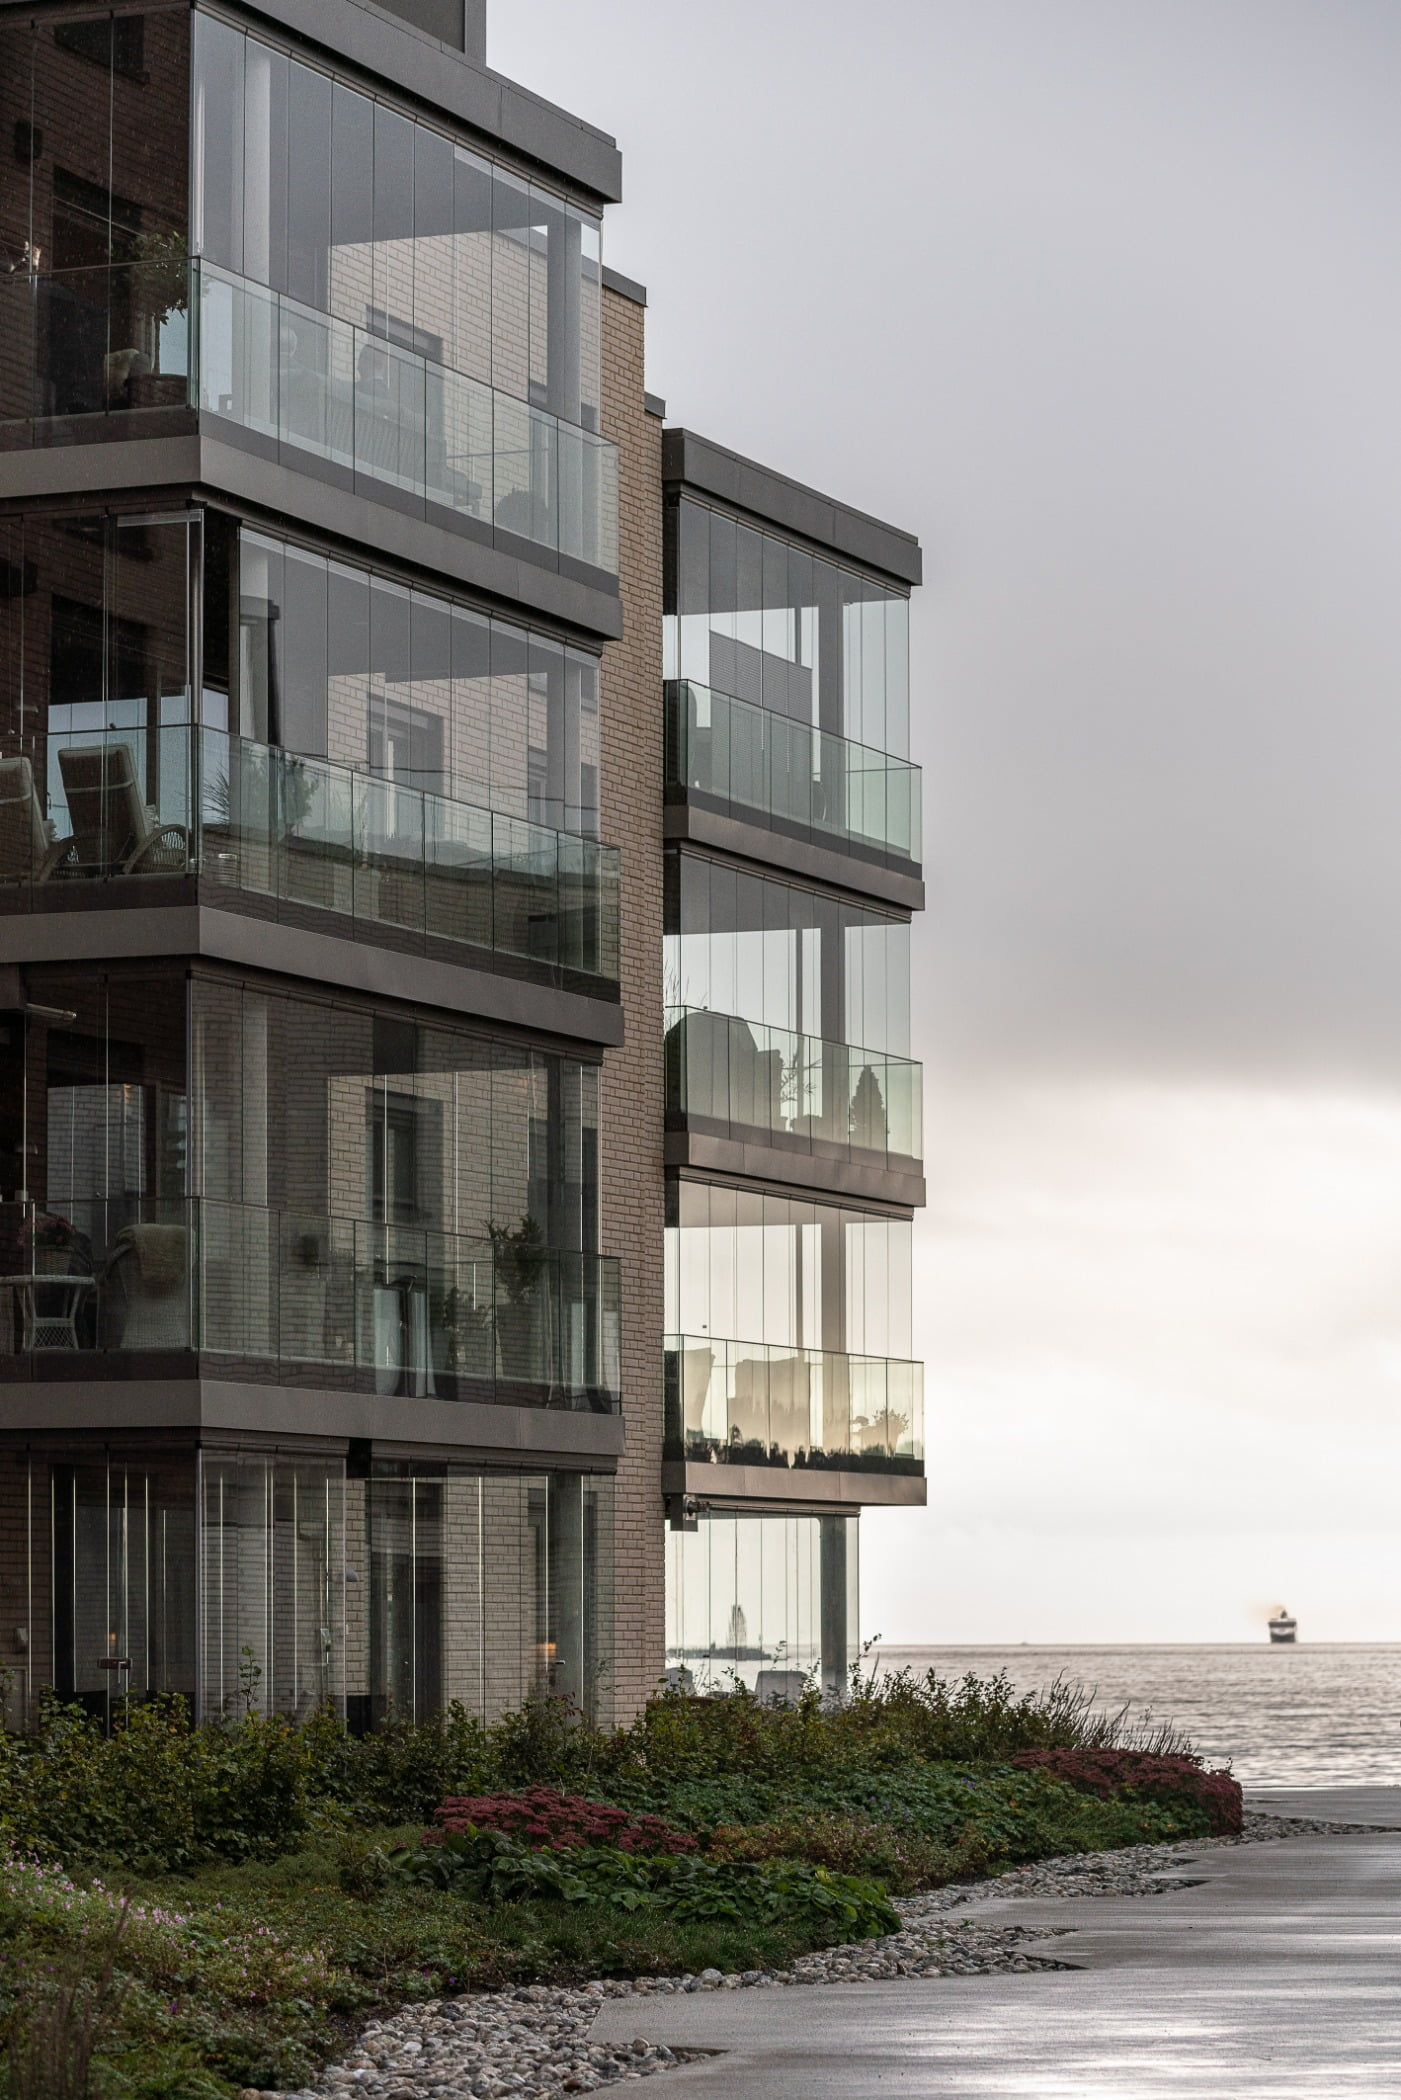 Urban design, Tower block, Plant, Water, Building, Sky, Cloud, Condominium, Window